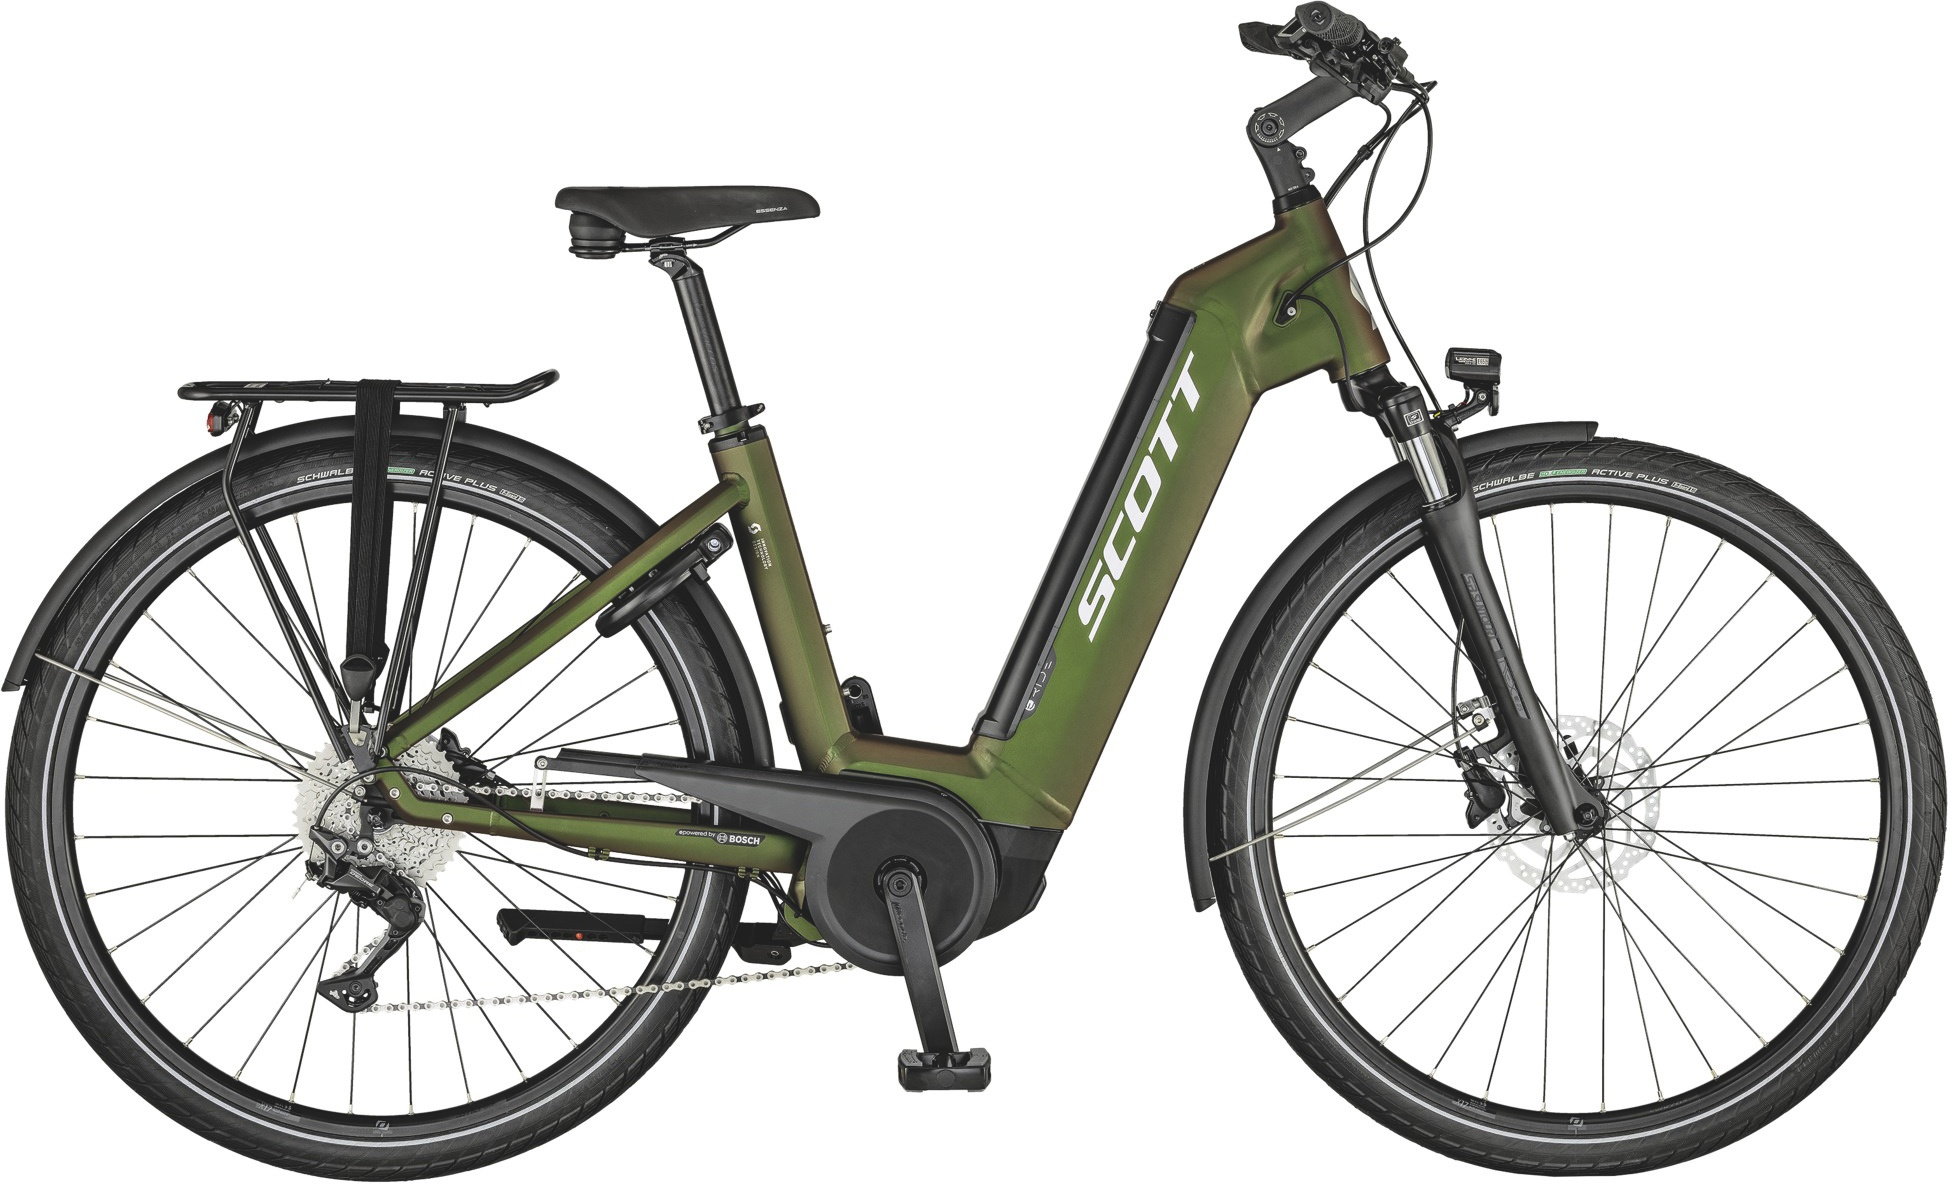 Scott Scott Sub Tour Eride 10 Usx 2021 Cykler > Elcykler